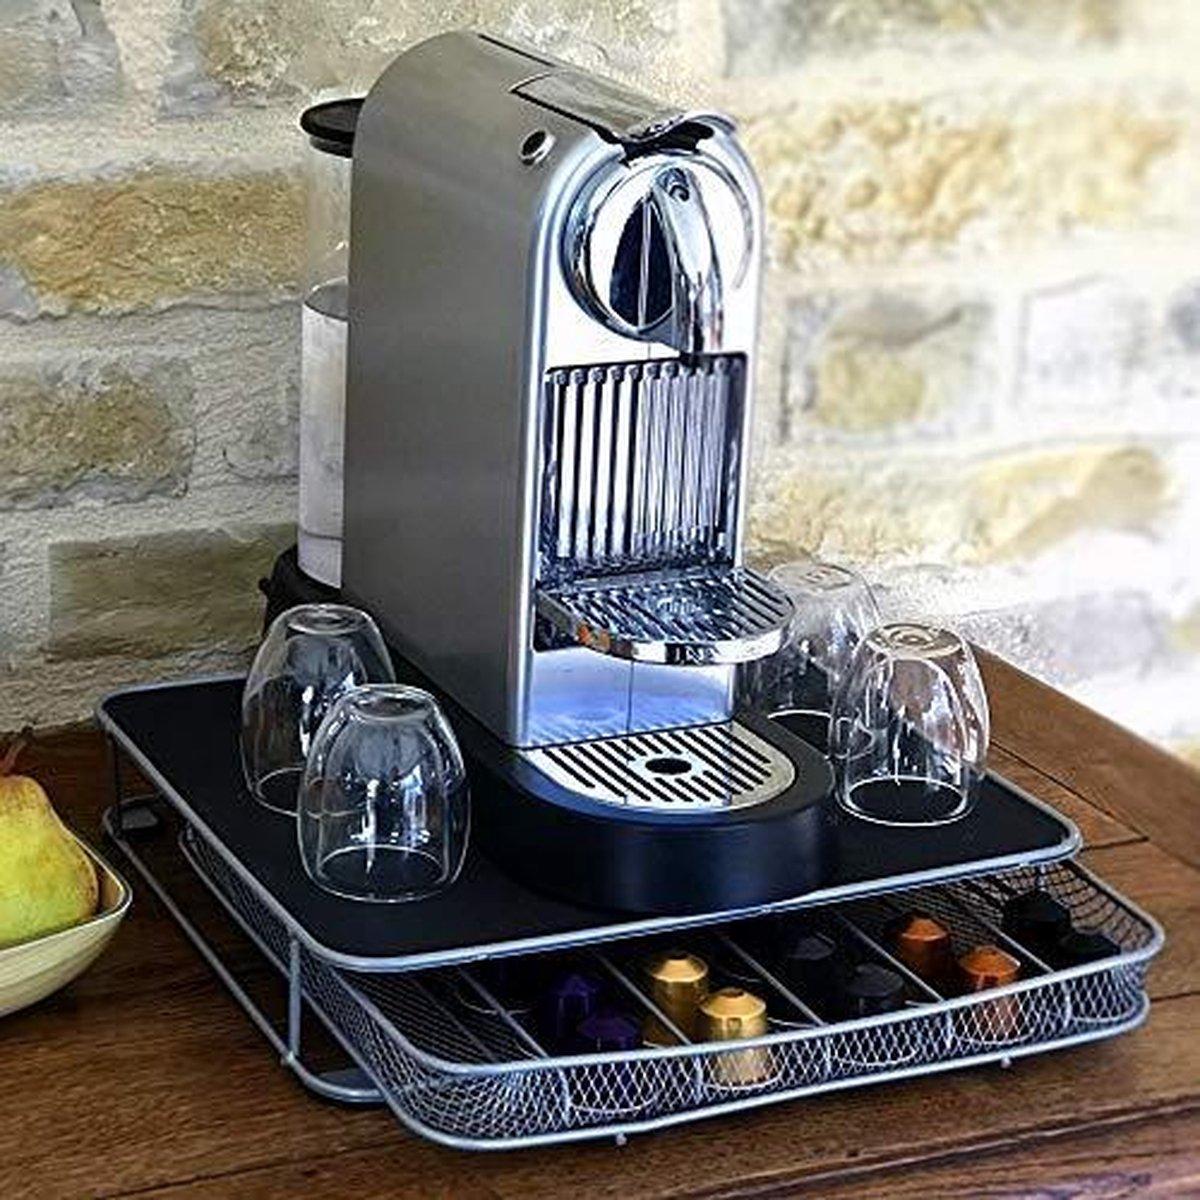 Capsulehouder  - Capsule lade - Koffie Capsule - Cuphouder Dispenser - Cups Houder - 30 Capsules